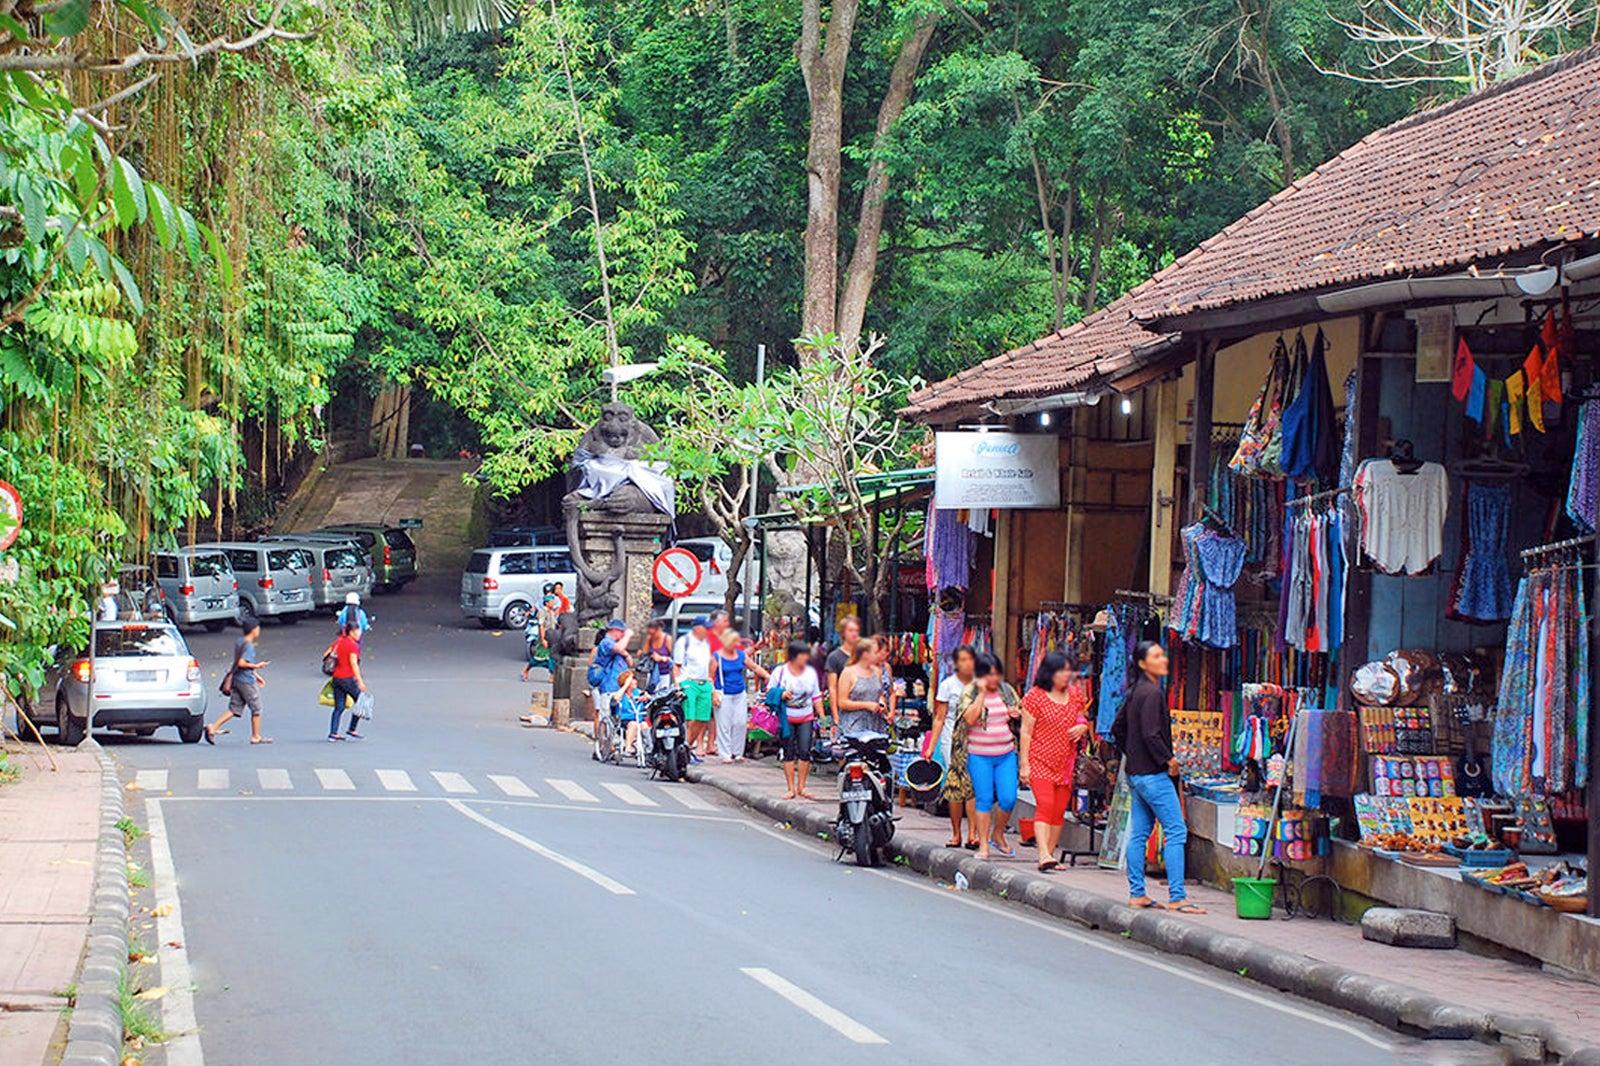 Ubud Monkey Forest Road - Sightseeing and Shopping Street in Ubud – Go  Guides